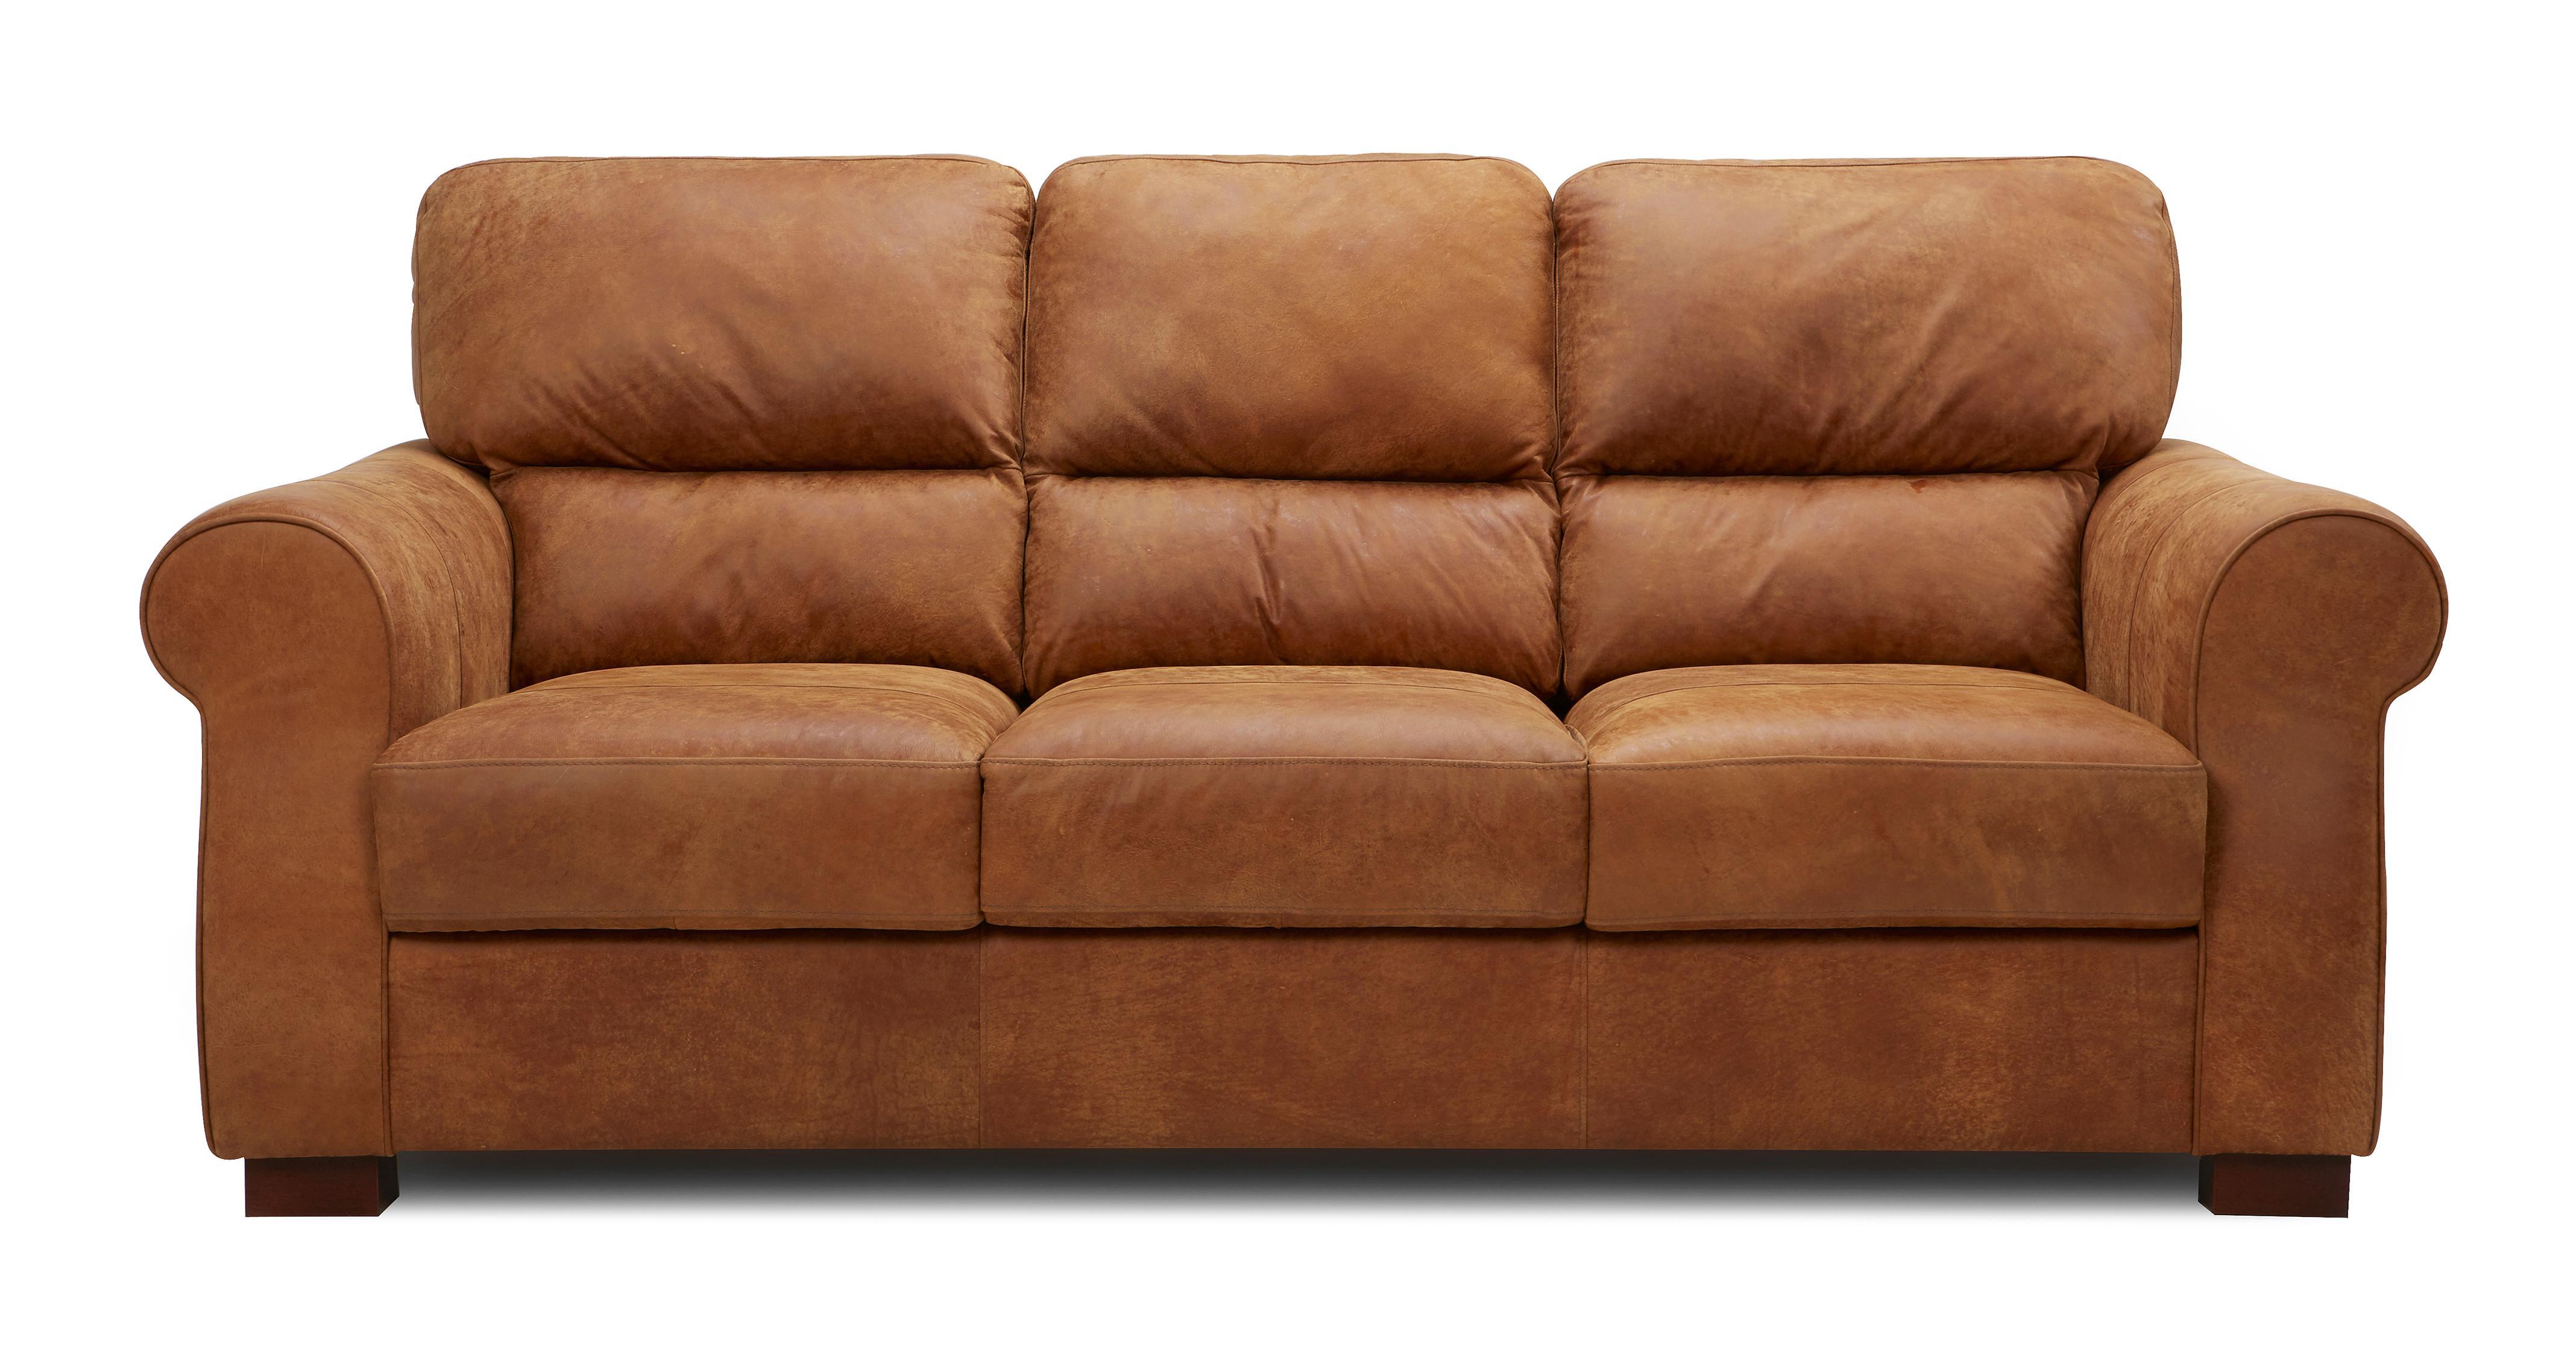 Great Garcia 3 Seater Sofa Saddle | DFS